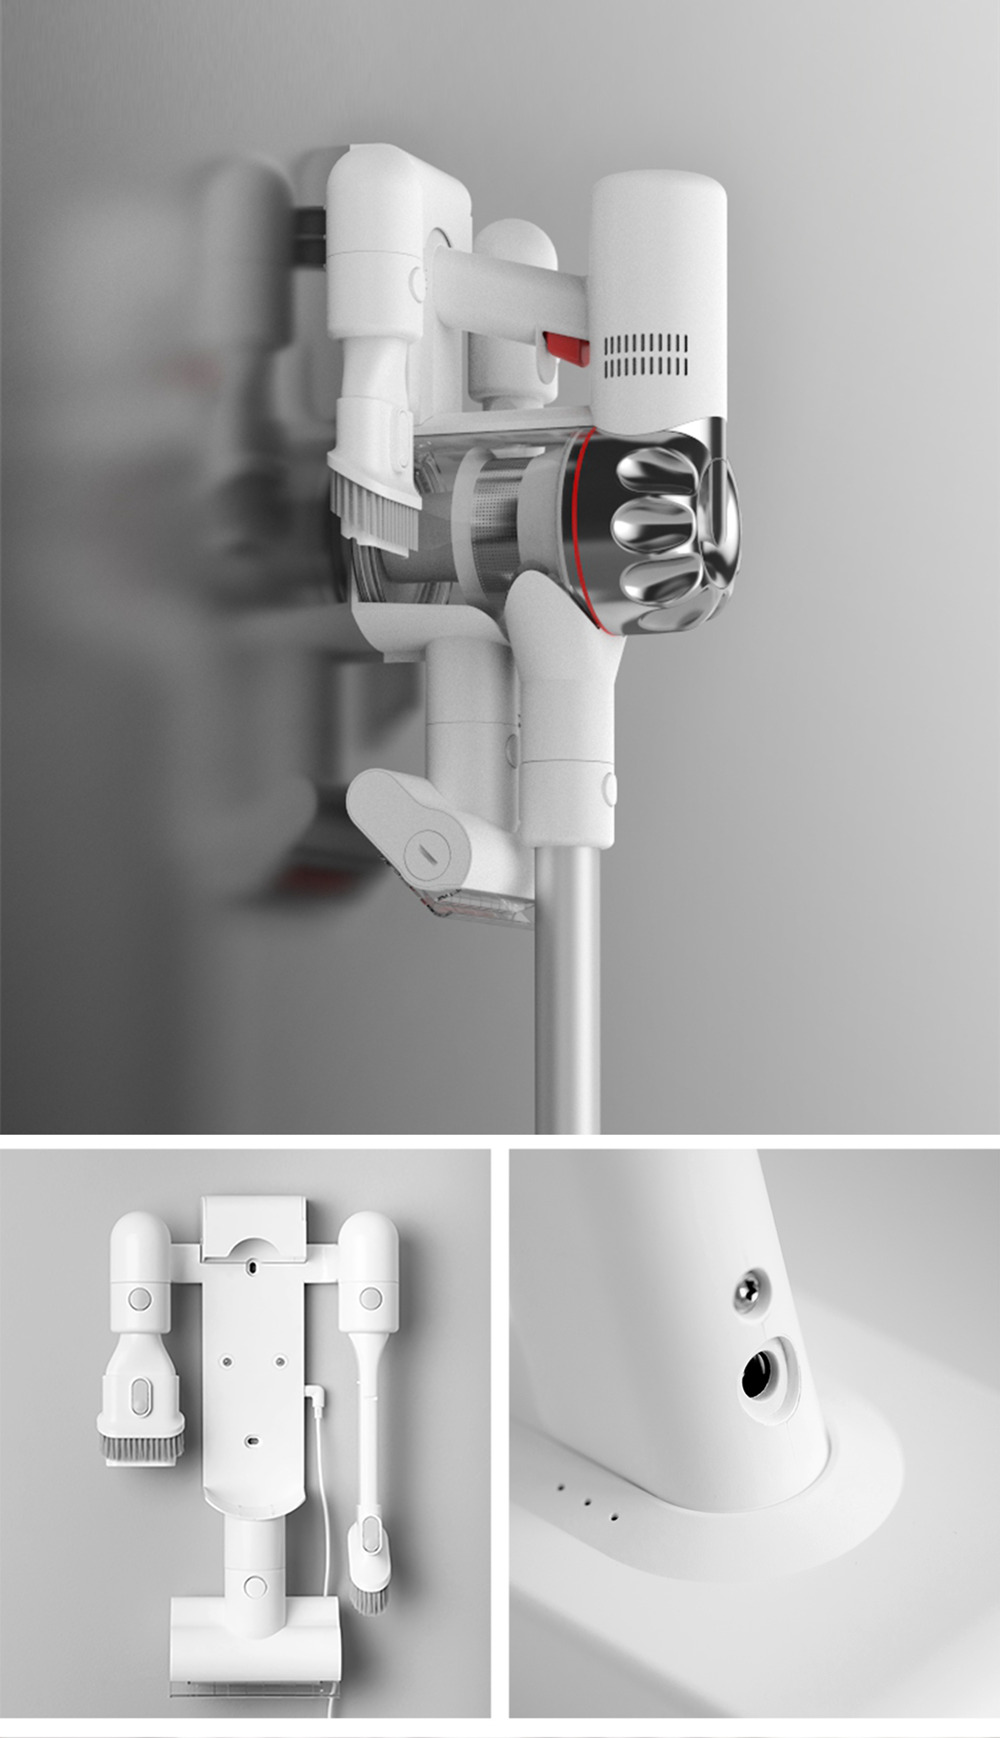 Ручной пылесос Xiaomi Dreame V9 White